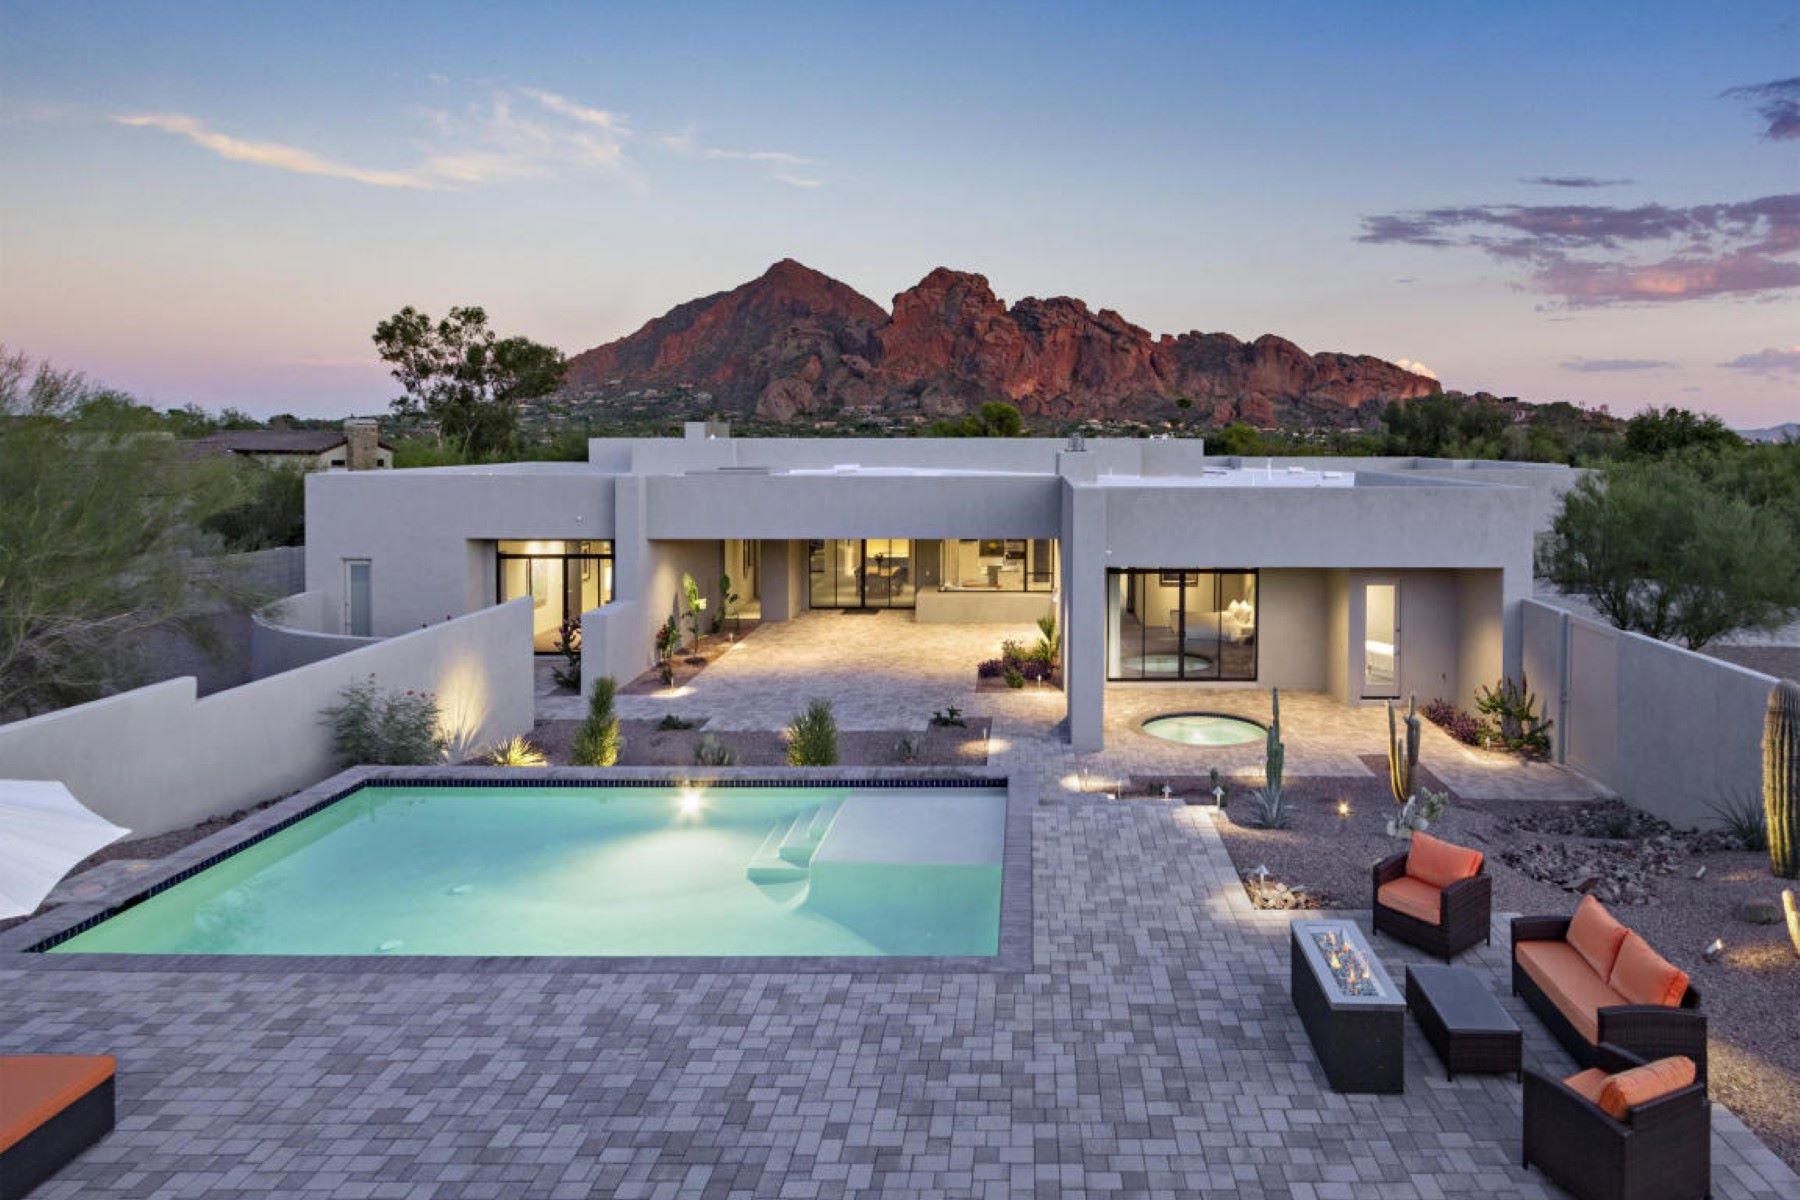 獨棟家庭住宅 為 出售 在 Luxury contemporary home in Paradise Valley 4700 E Sierra Vista Dr Paradise Valley, 亞利桑那州, 85253 美國